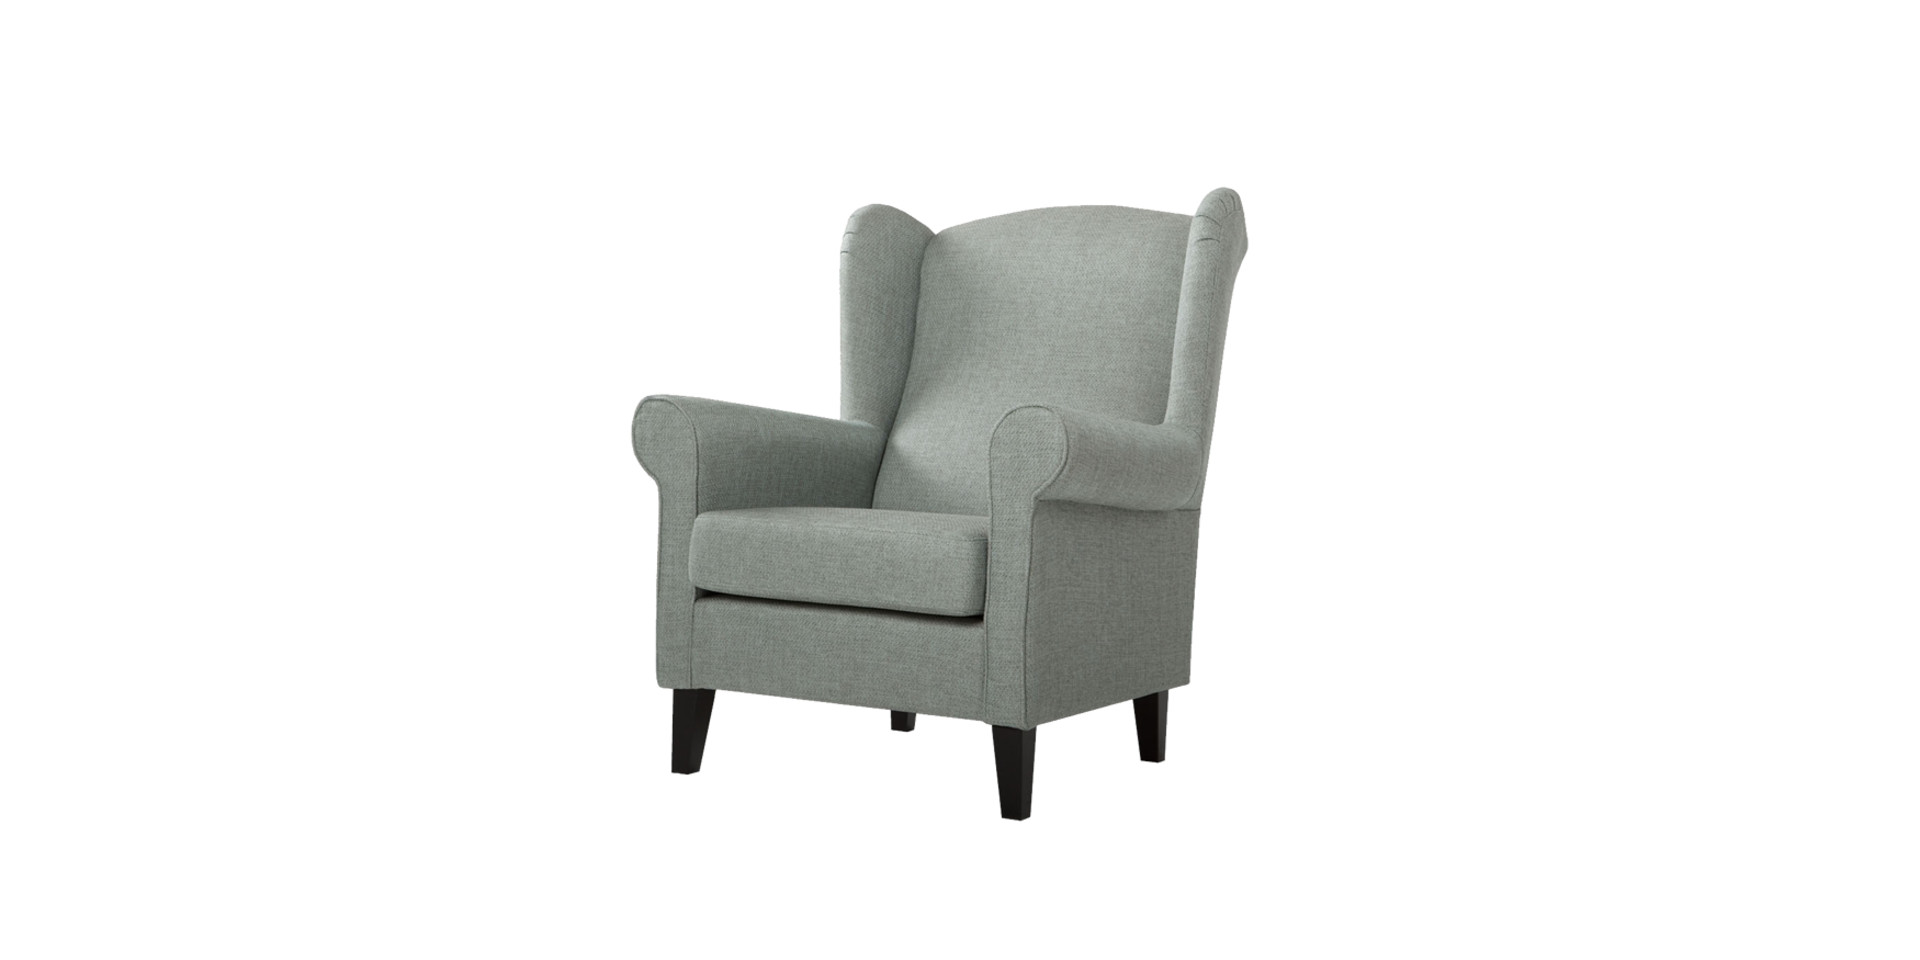 sits-watson-fauteuil-armchair_himalaya7_green_4